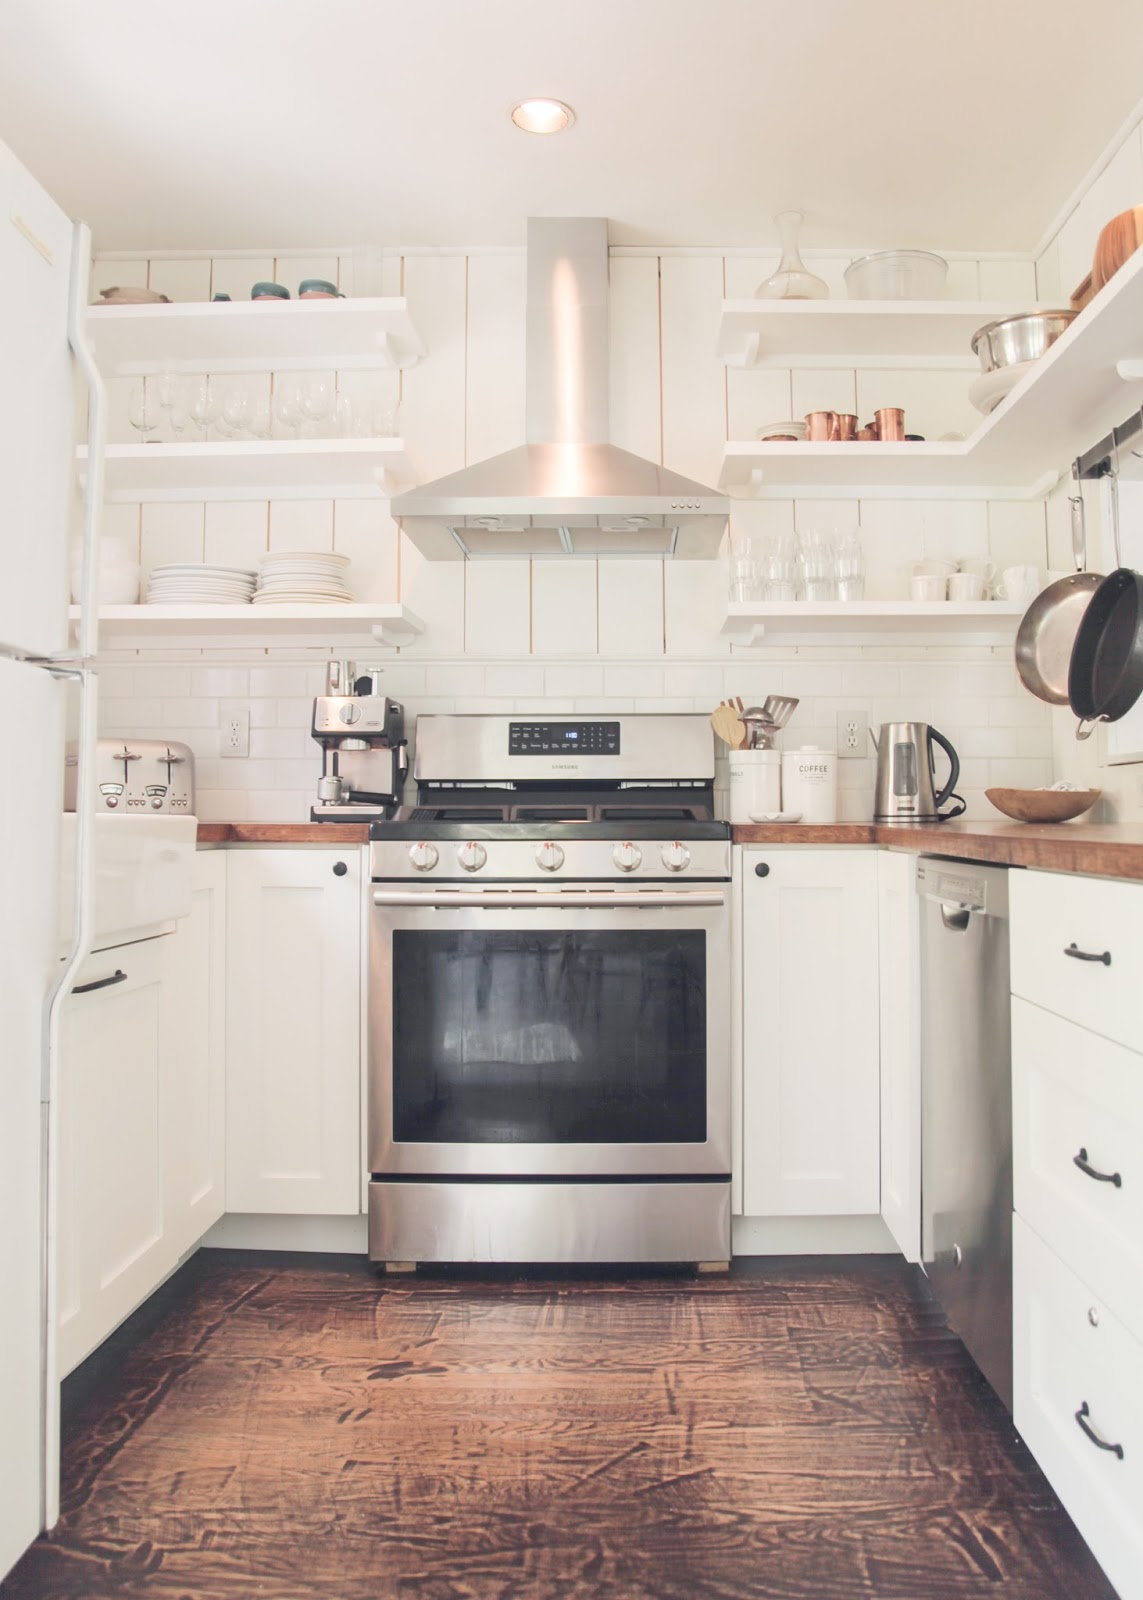 Modern Farmhouse Kitchen Decor Inspiration